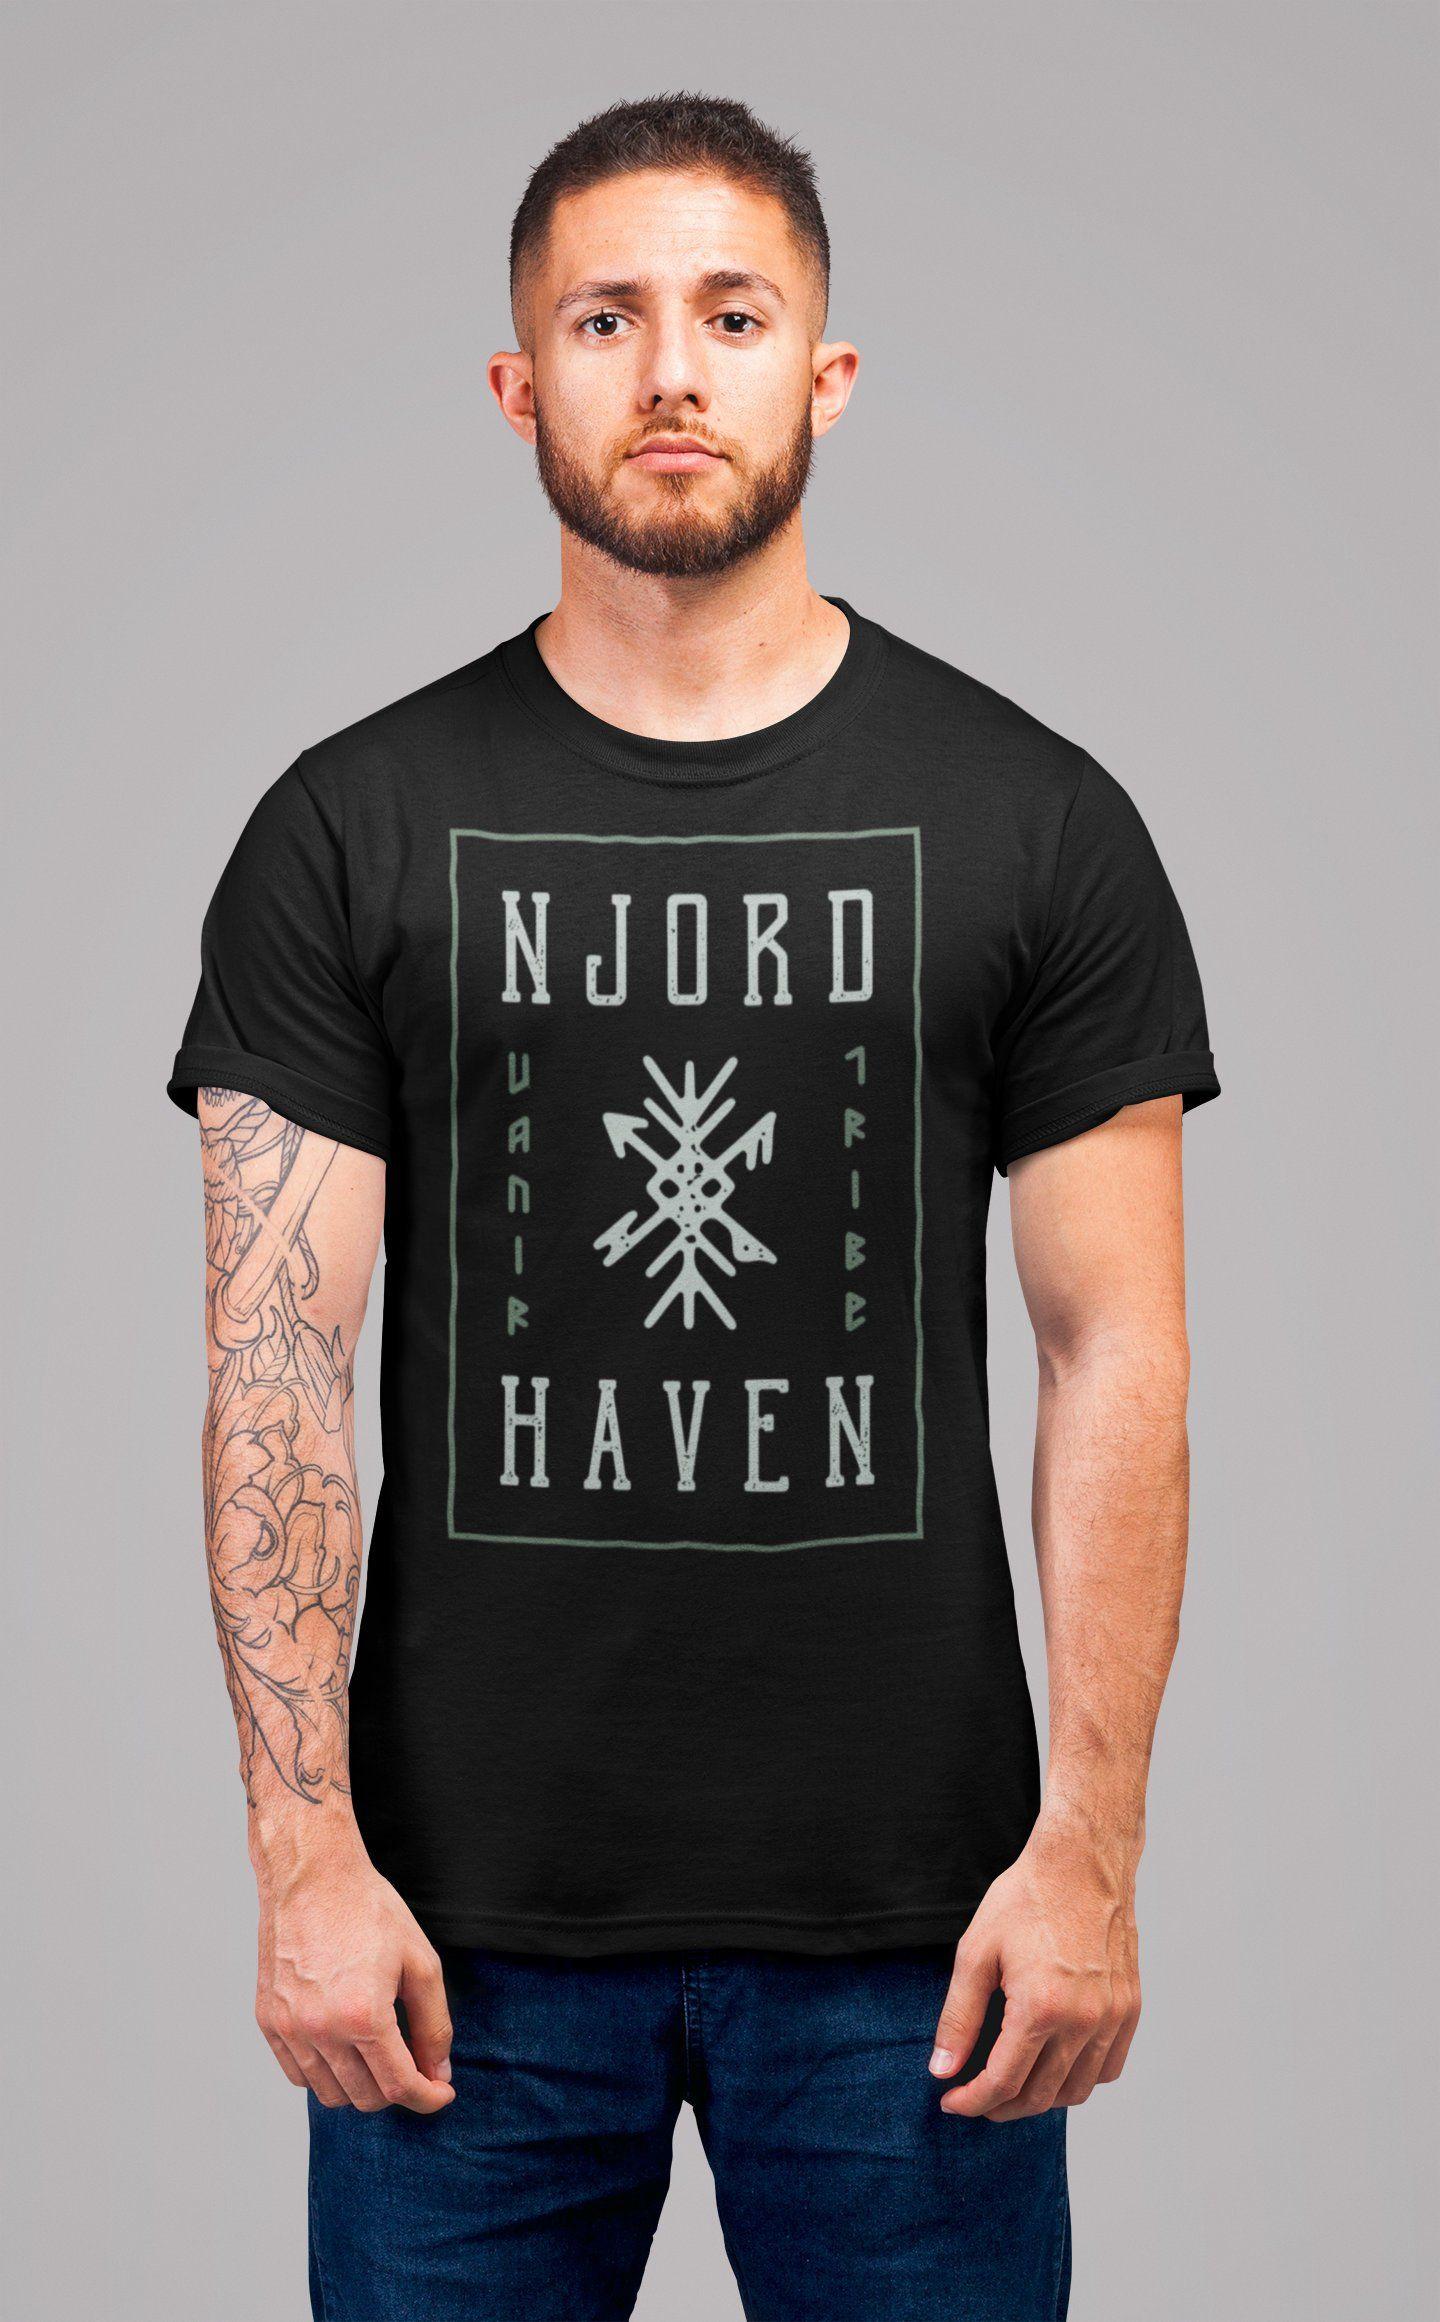 c2562fe54 Men's Viking T Shirt Njord Haven Viking Shirt Vanir Shirts Runes Shirt  Vintage Graphic Tee Ancient